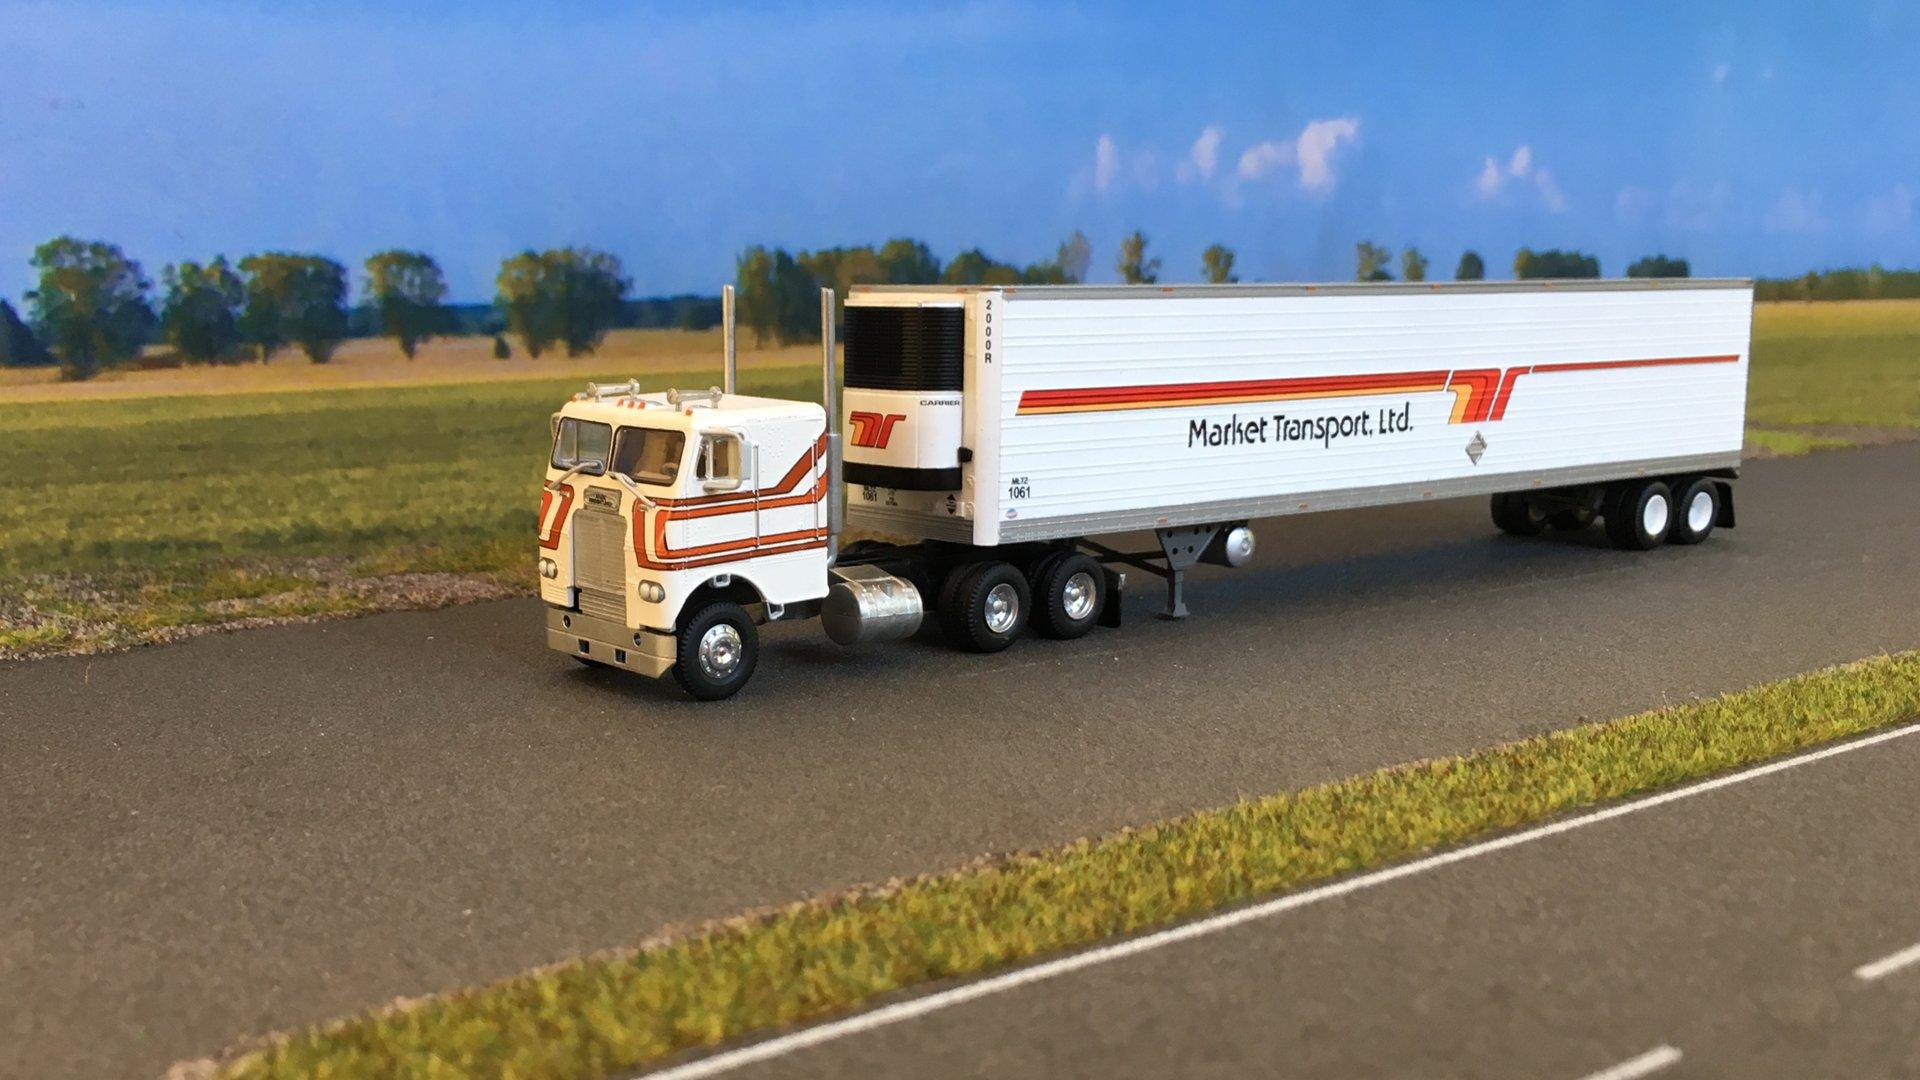 Freightliner Market Transport 02.jpg